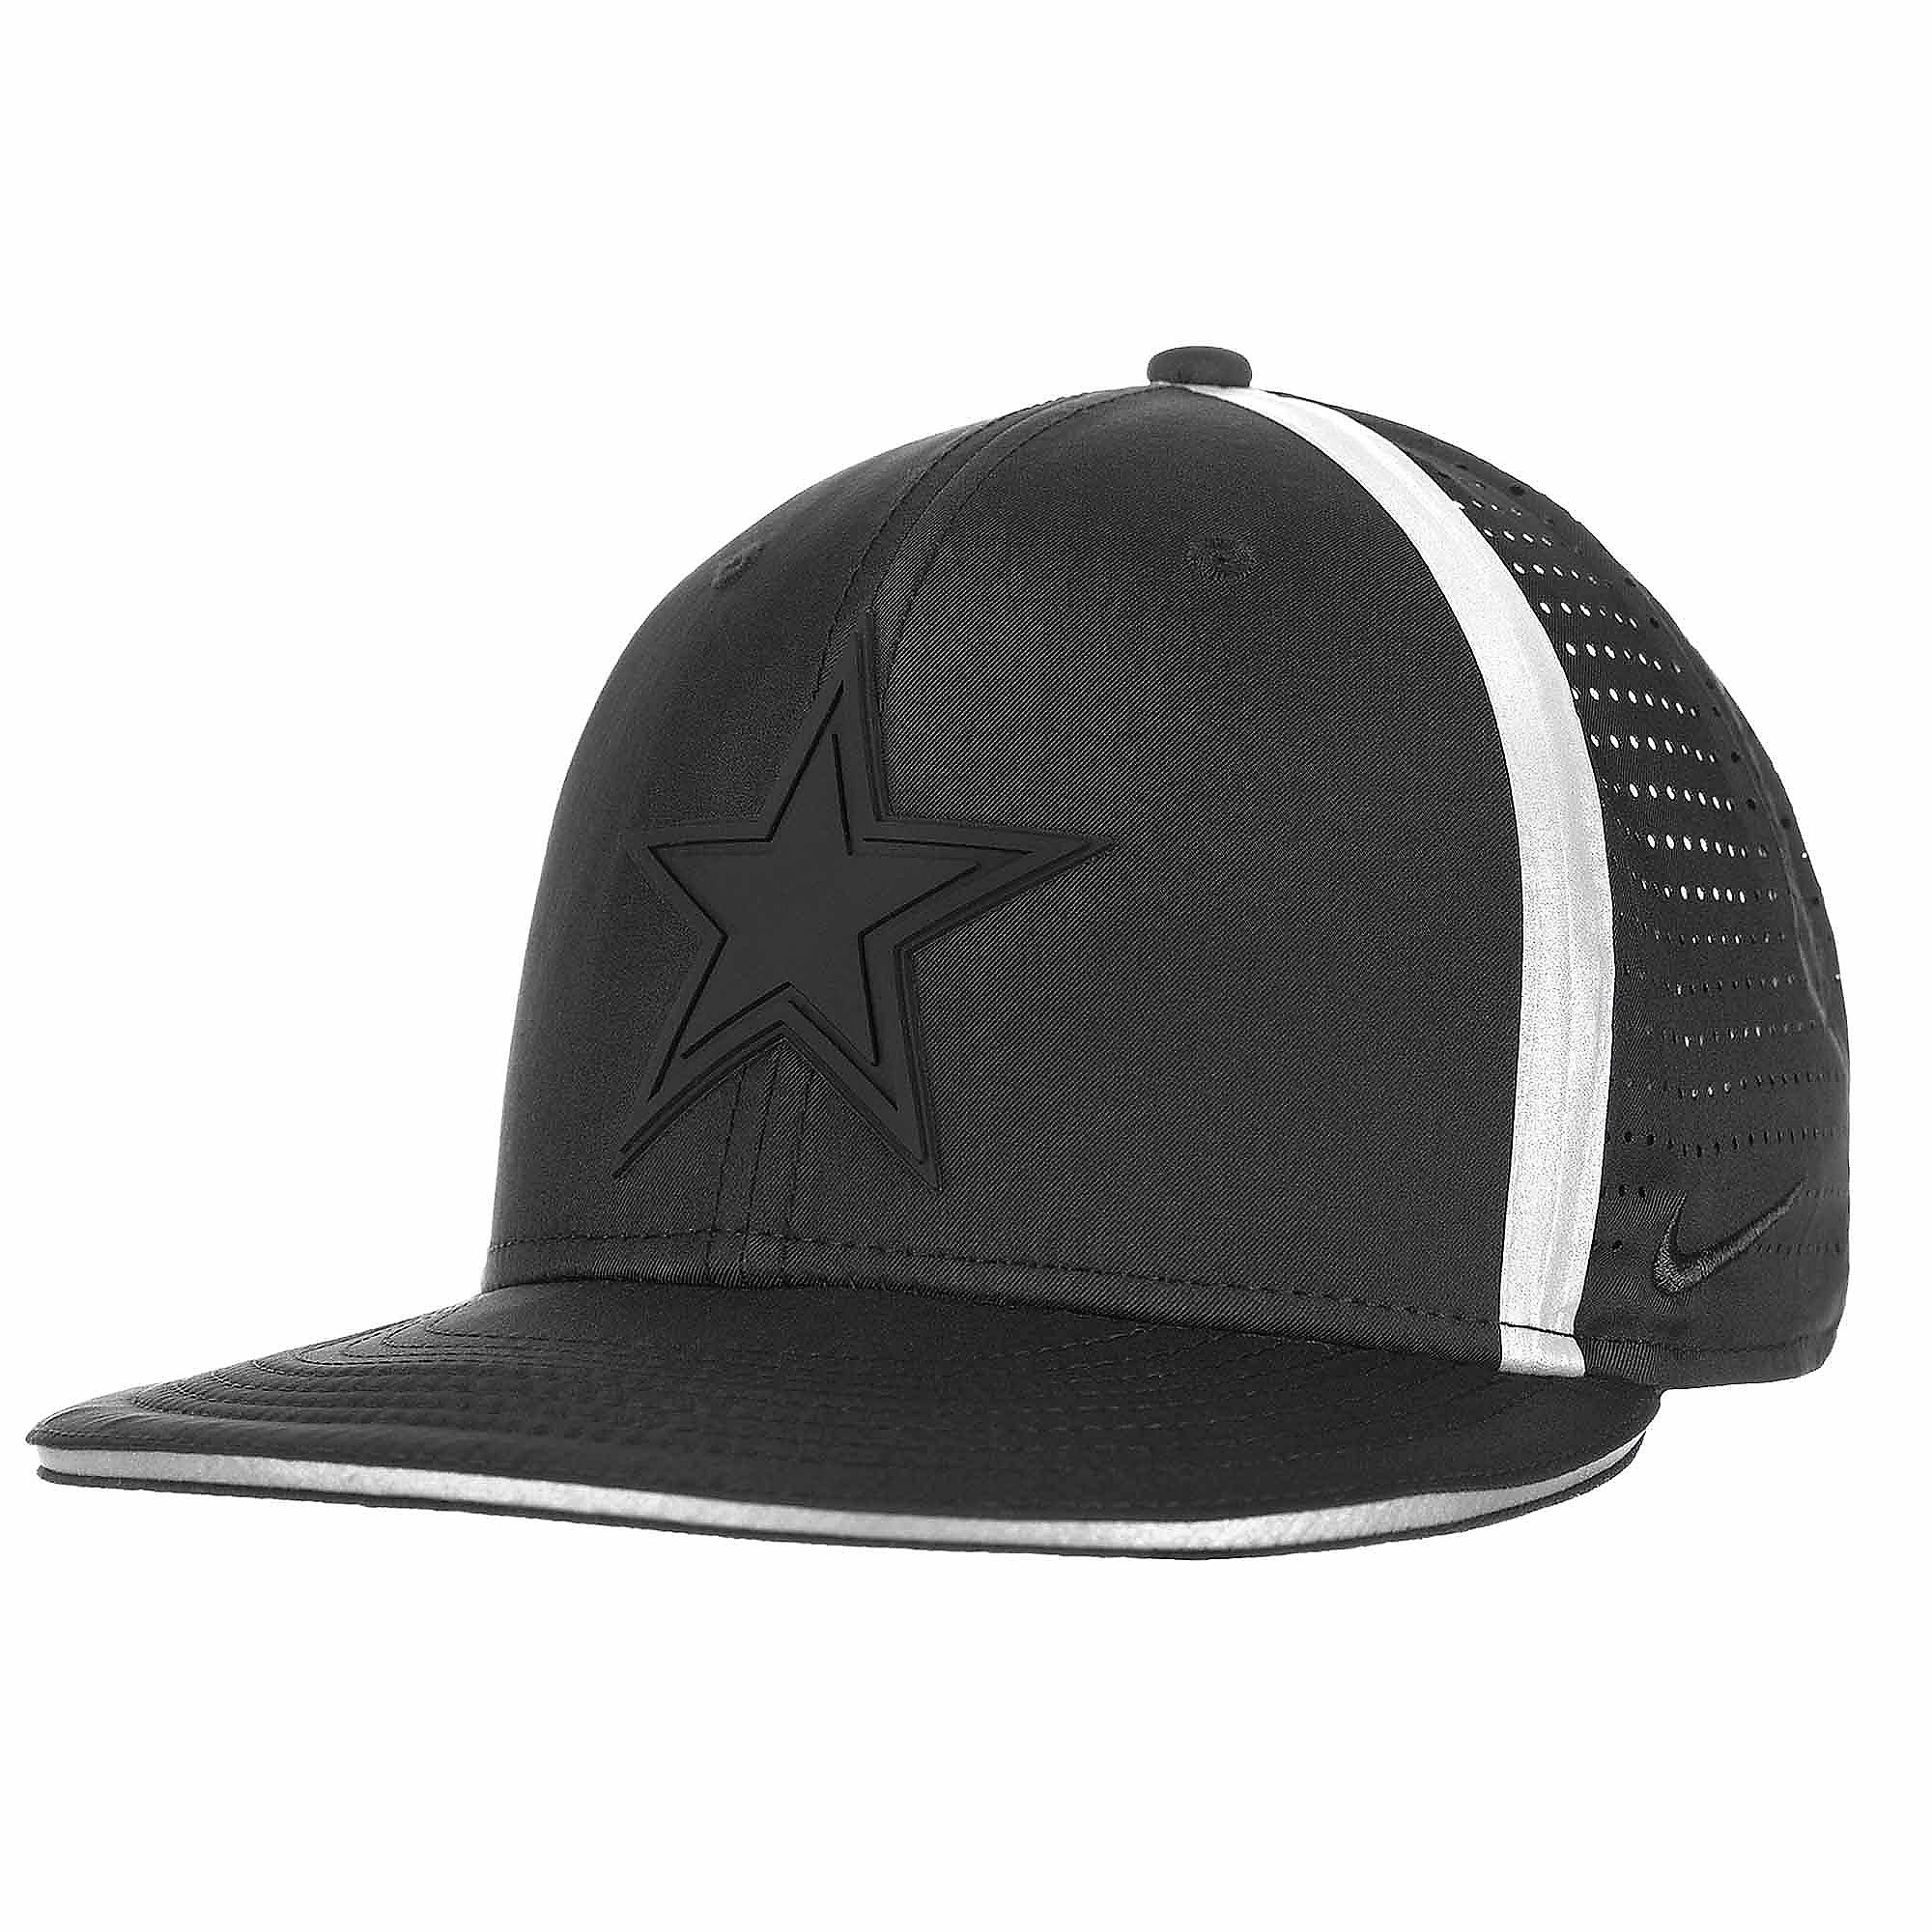 76368e16 Dallas Cowboys Nike New Day Aerobill True Cap | Dallas Cowboys Pro Shop